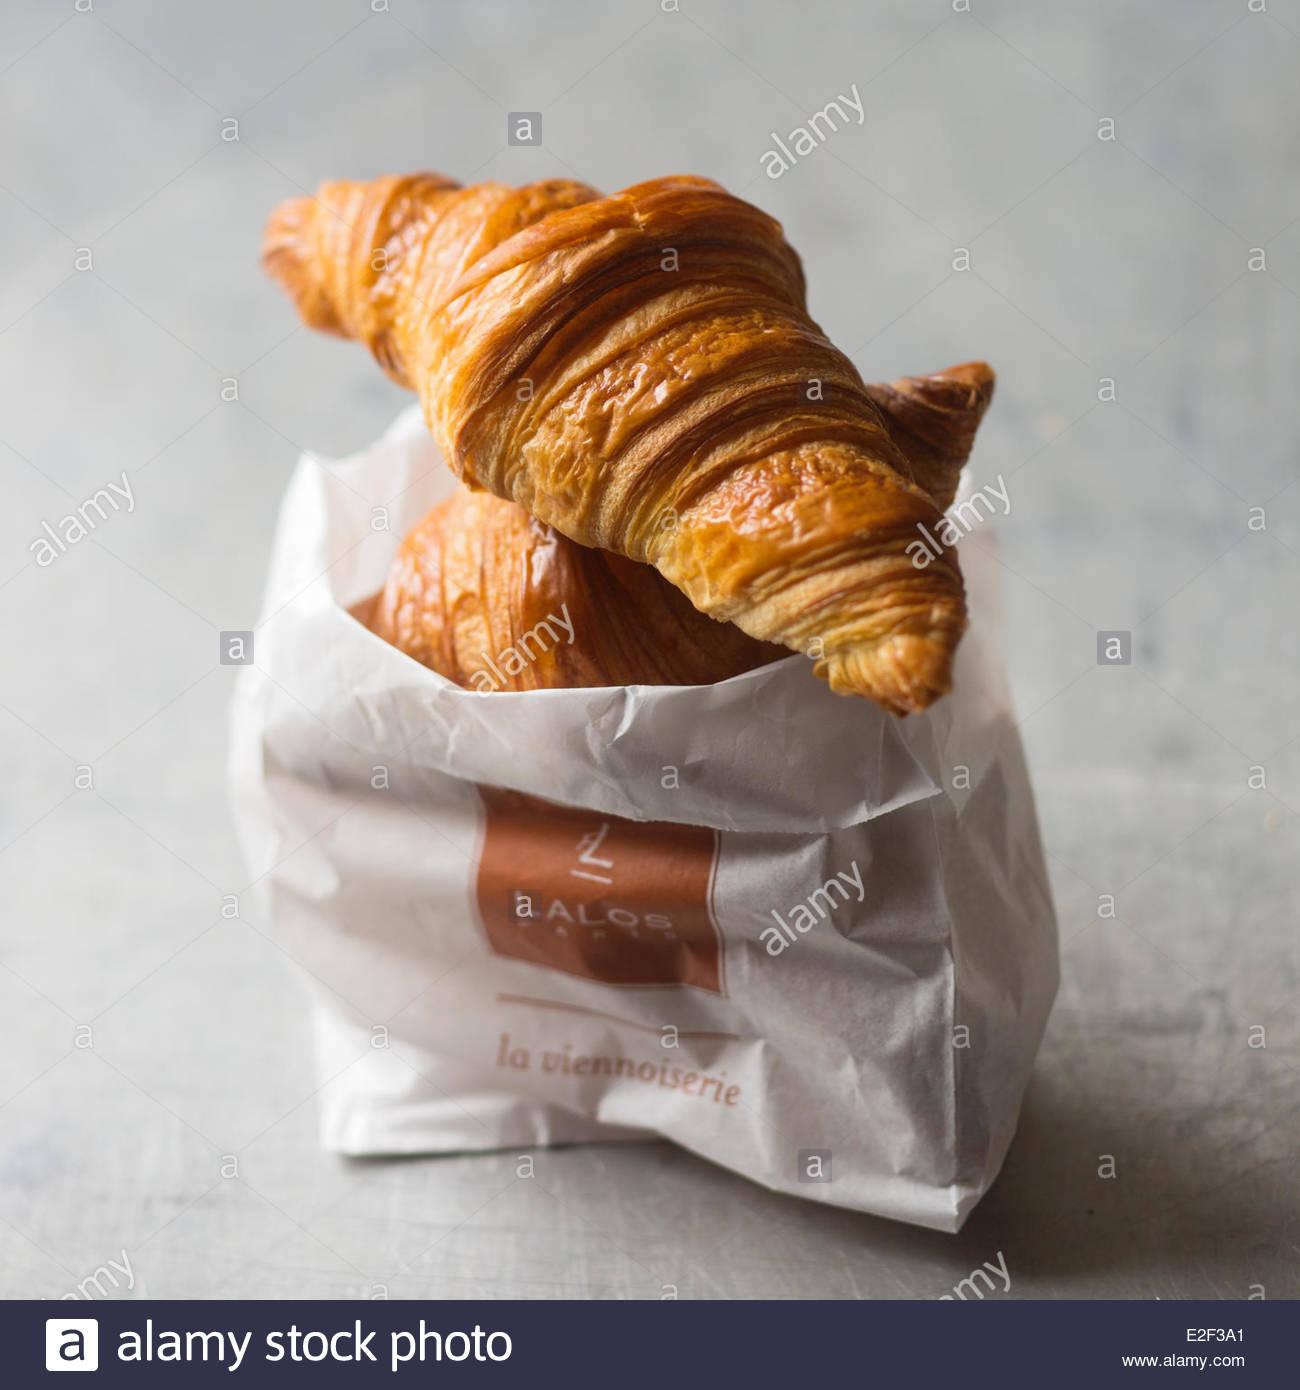 France, Paris, French Butter Croissants - Stock Image